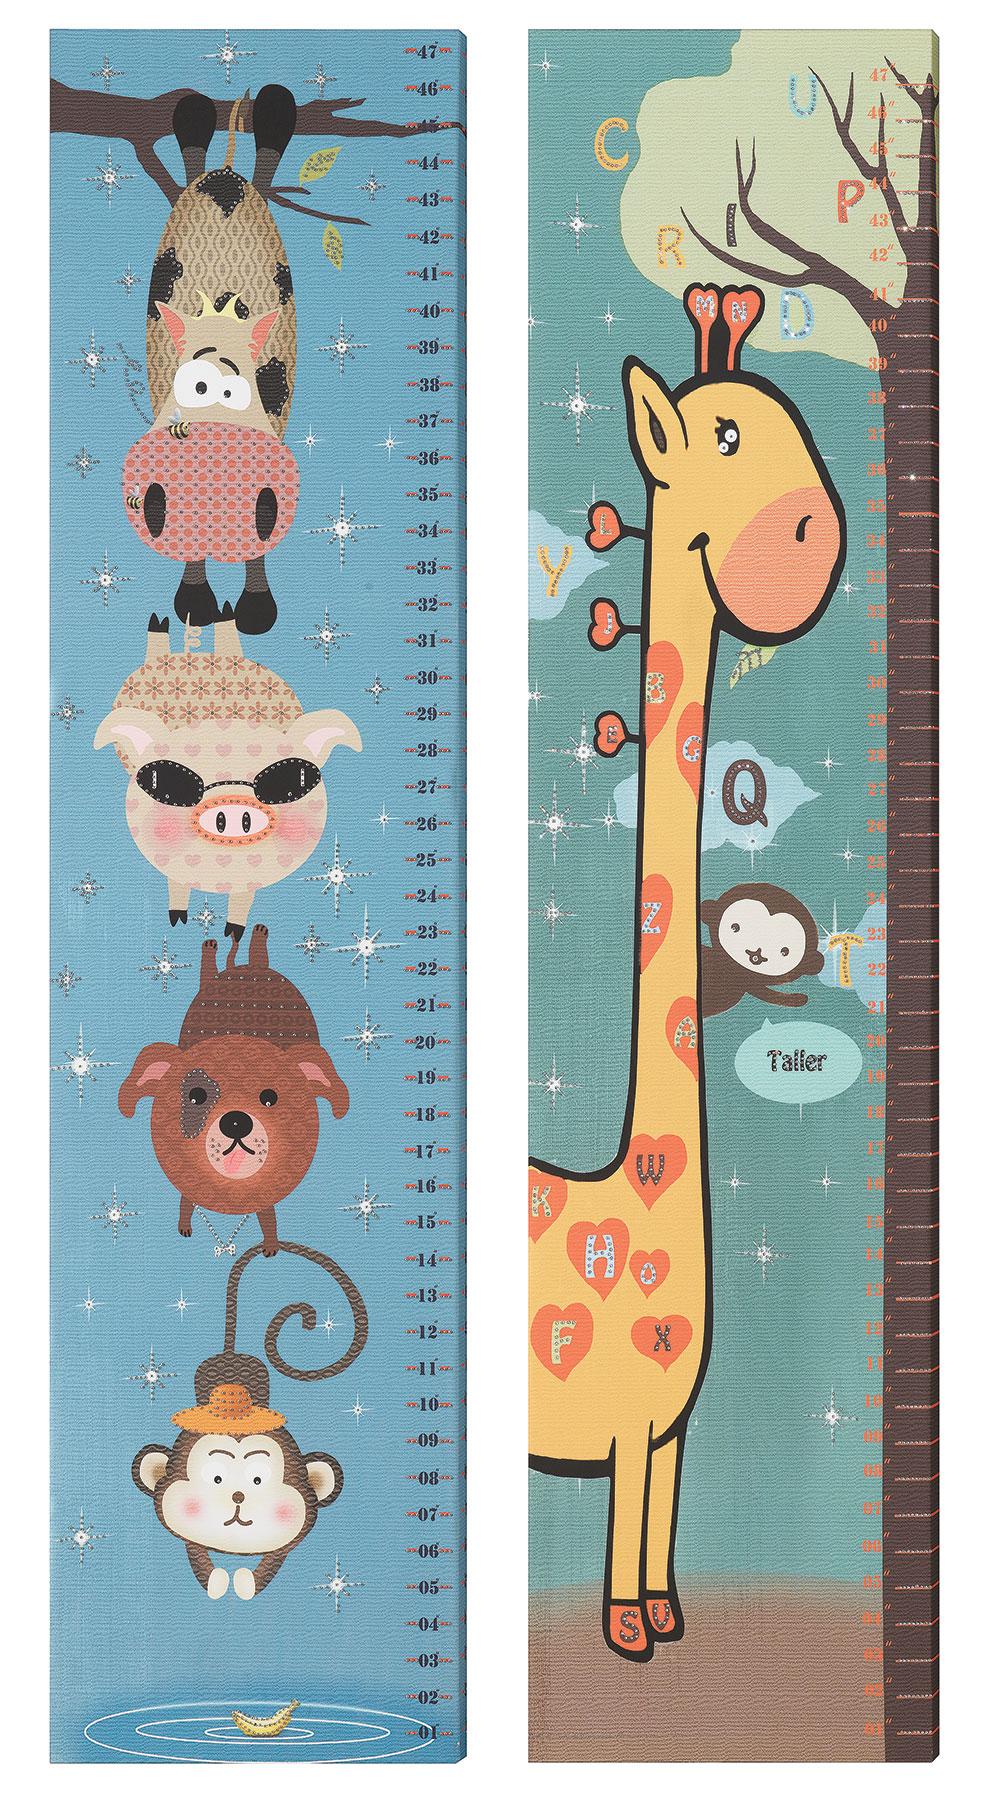 Coaster Wall Art Art - Item Number: 960939